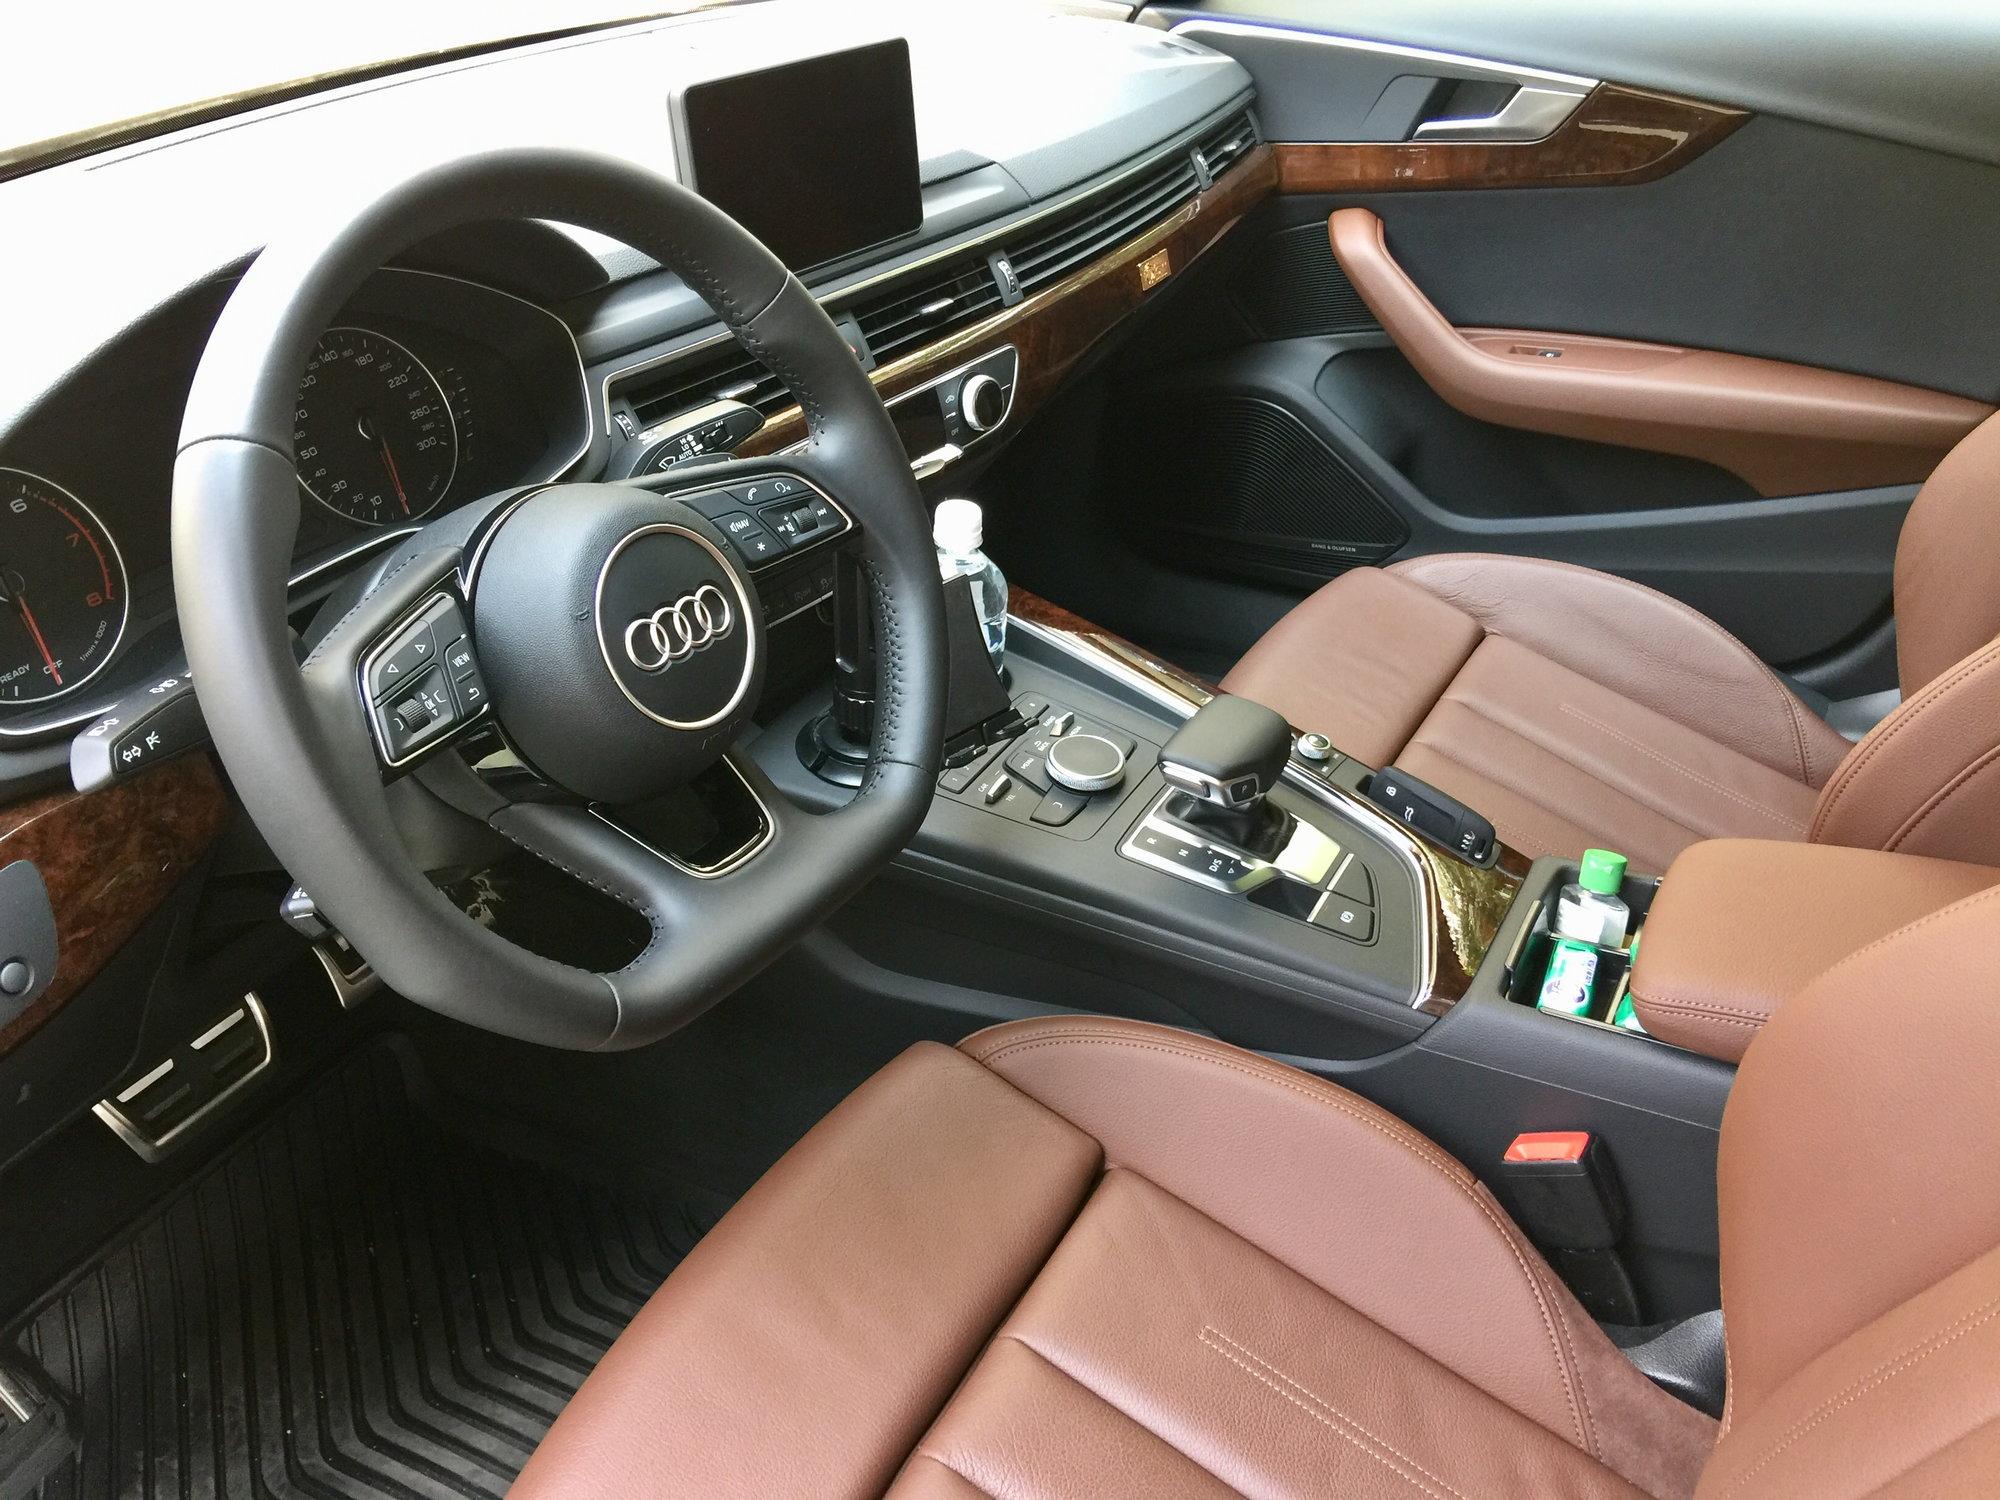 Interior Mods - AudiWorld Forums